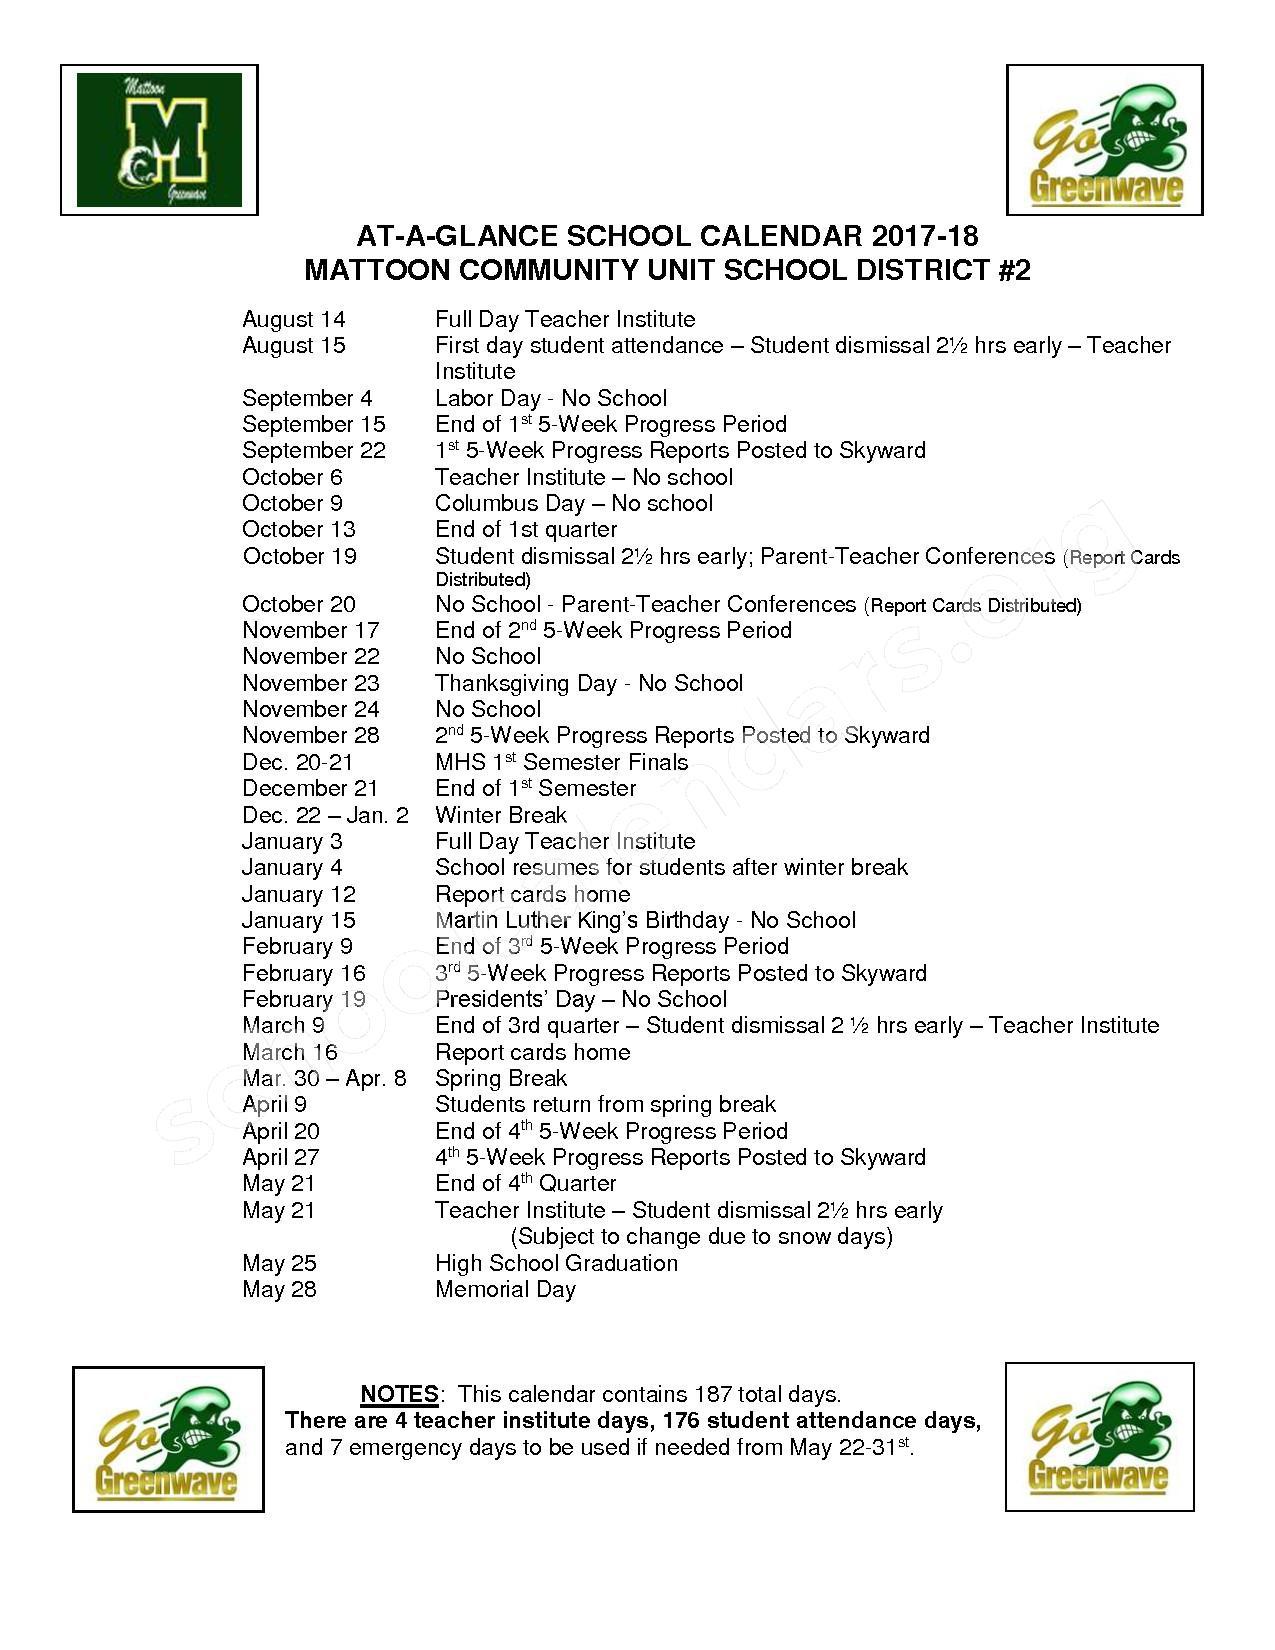 2017 - 2018 District Calendar – Mattoon Community Unit School District 2 – page 1